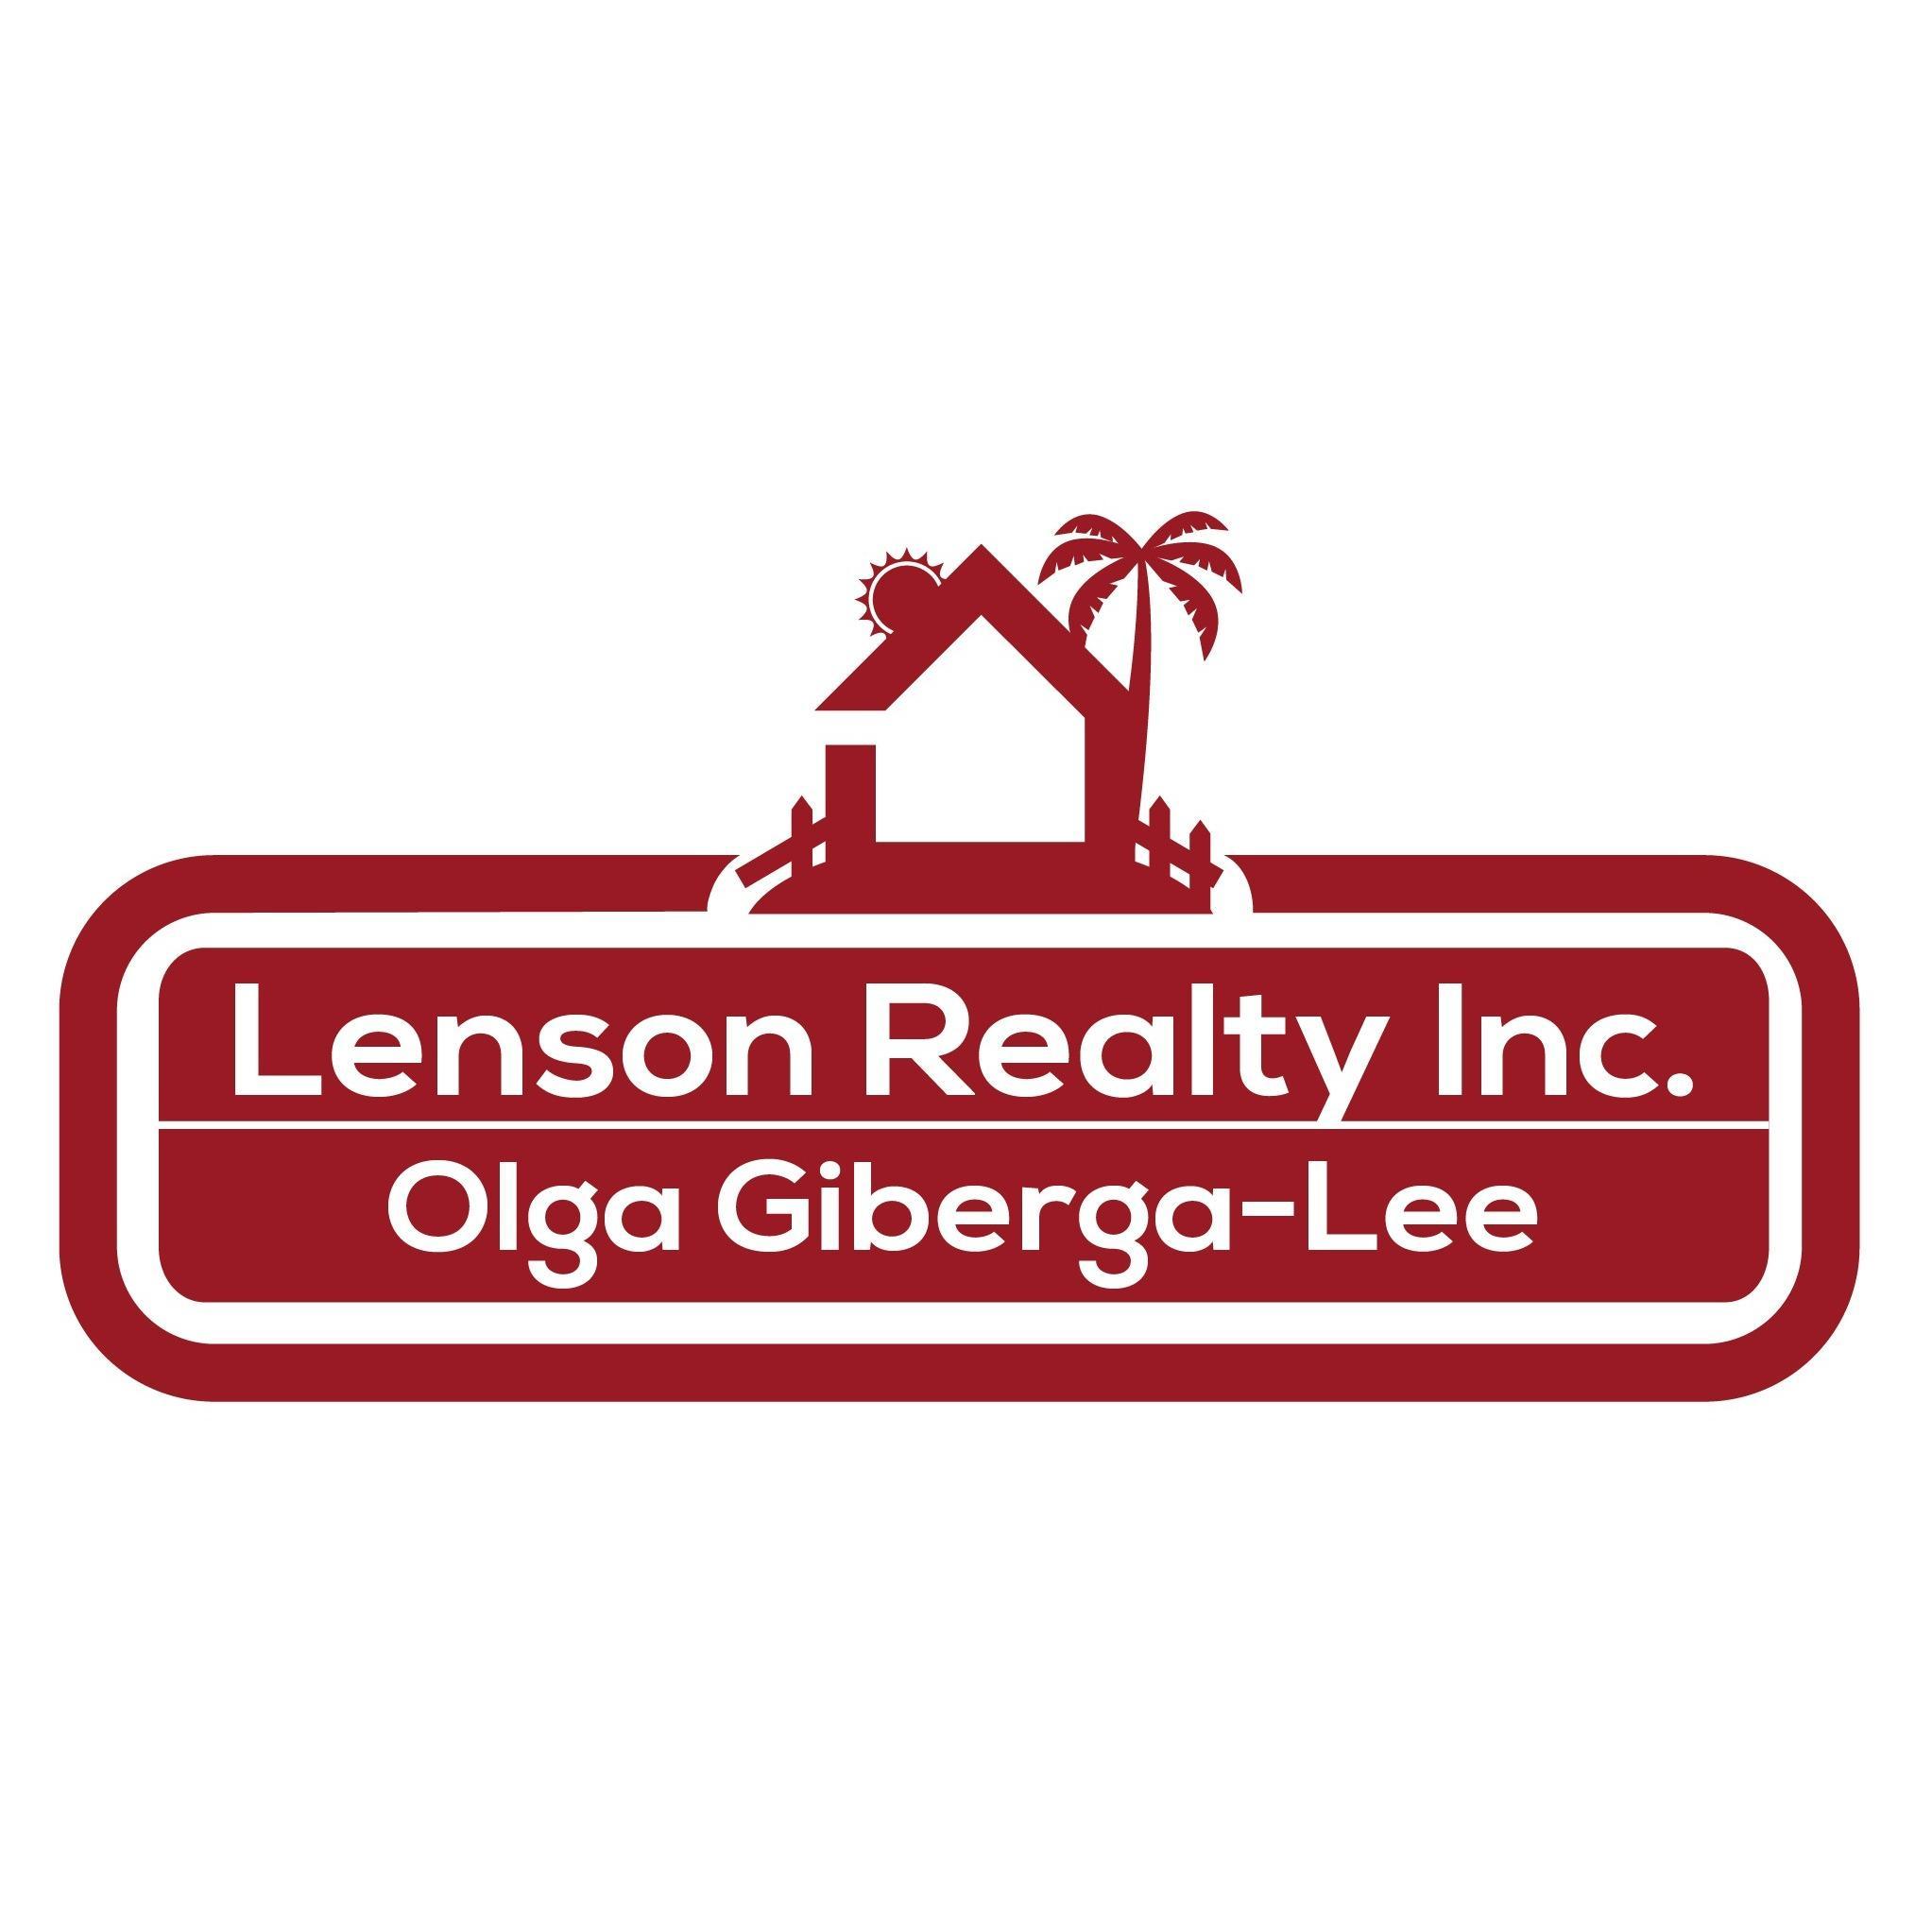 Lenson Realty Inc: Olga Giberga-Lee